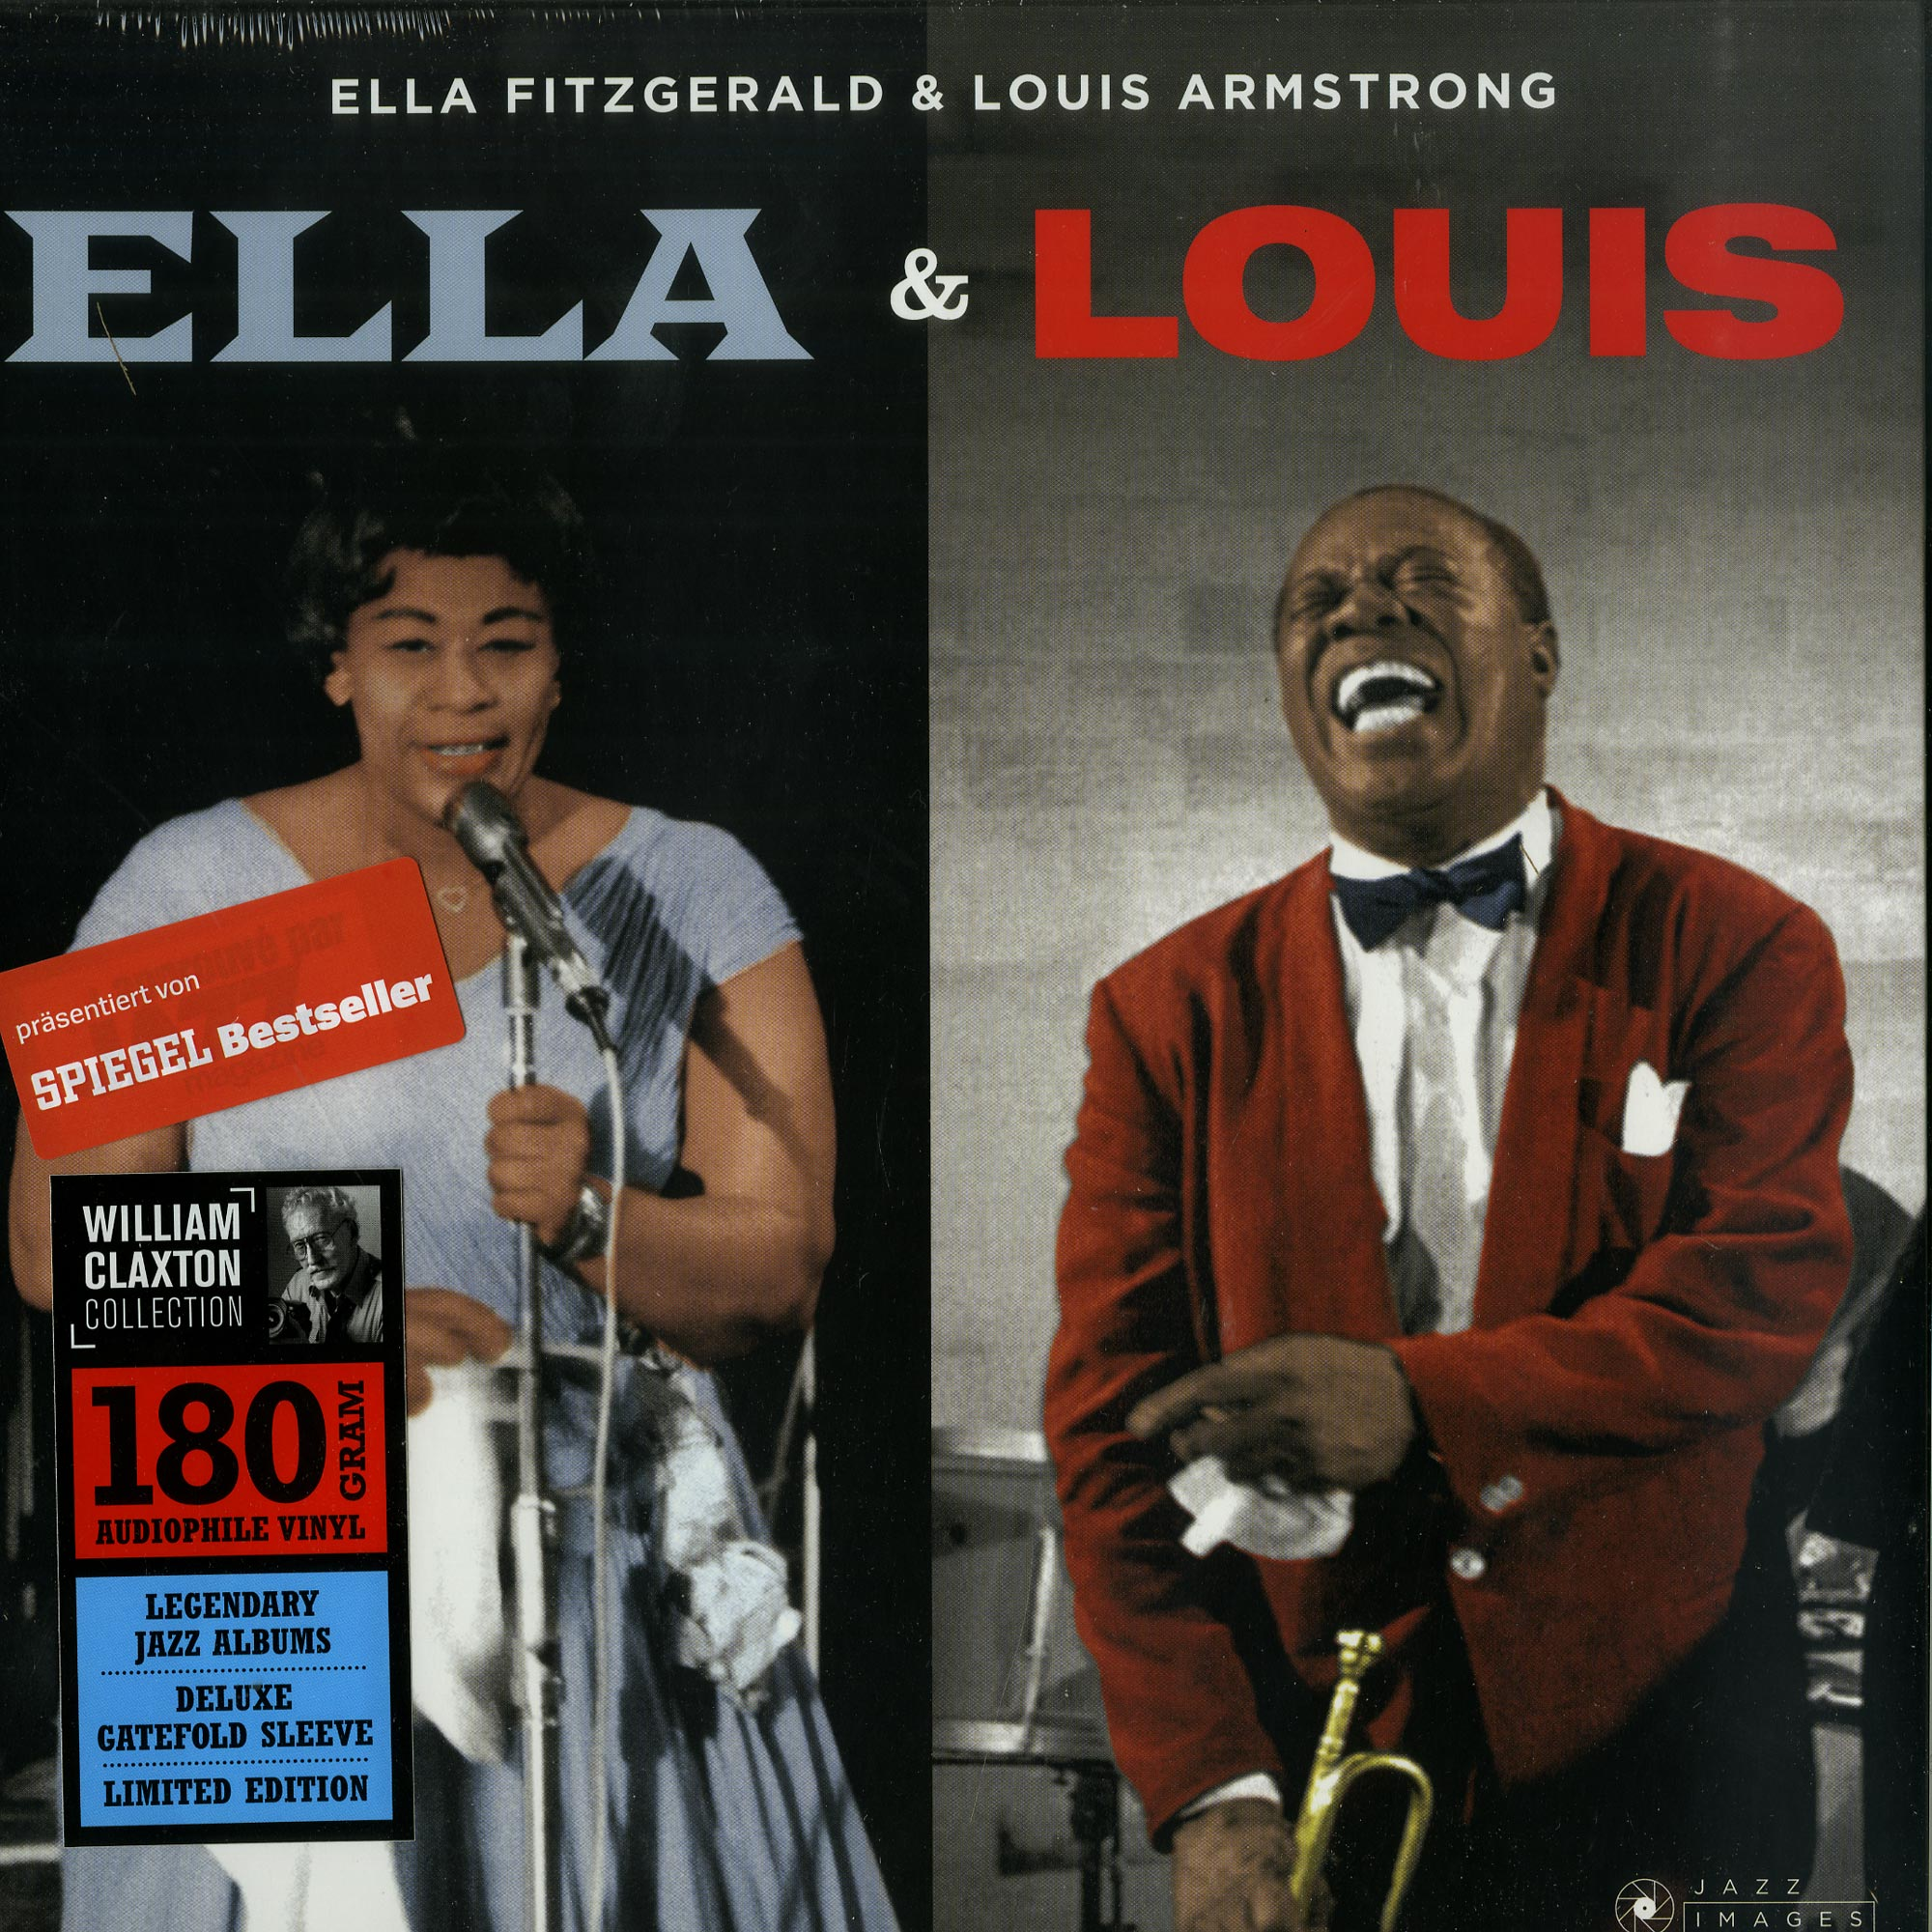 Ella Fitzgerald & Louis Armstrong - ELLA & LOUIS